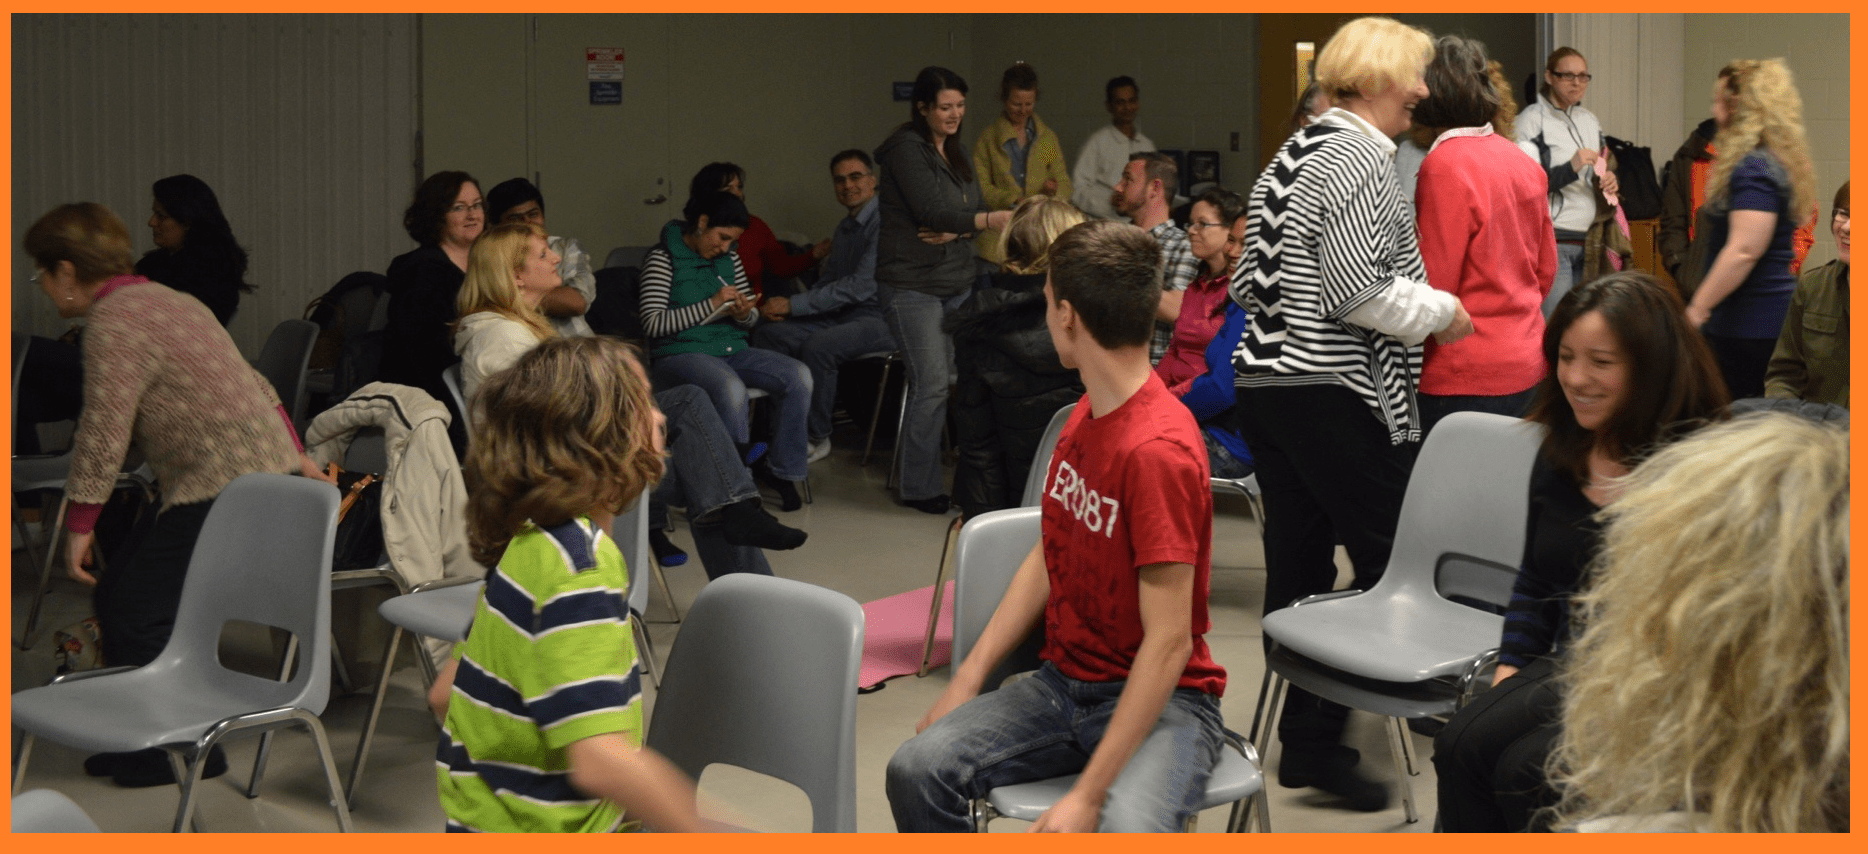 Discussions - Sharing IMpressions at Burlington Inner Peace Public Program